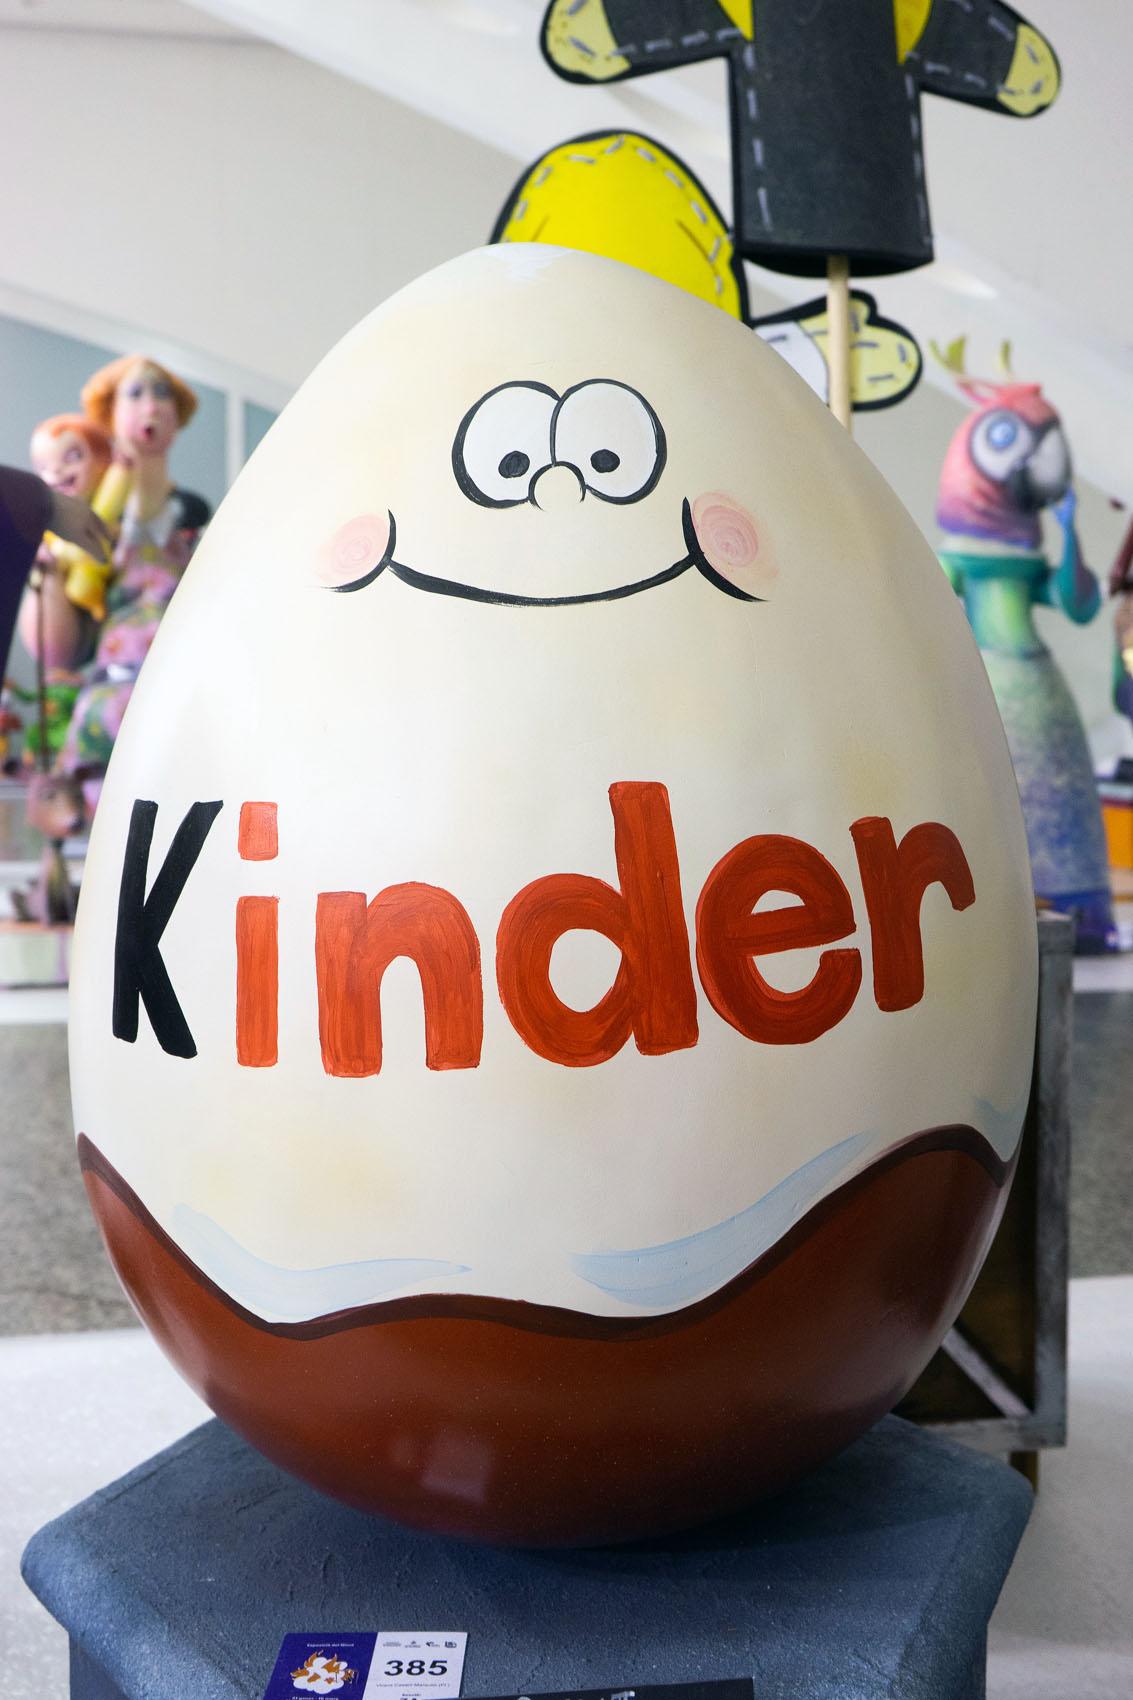 Kinderei Egg Kinder Ninot